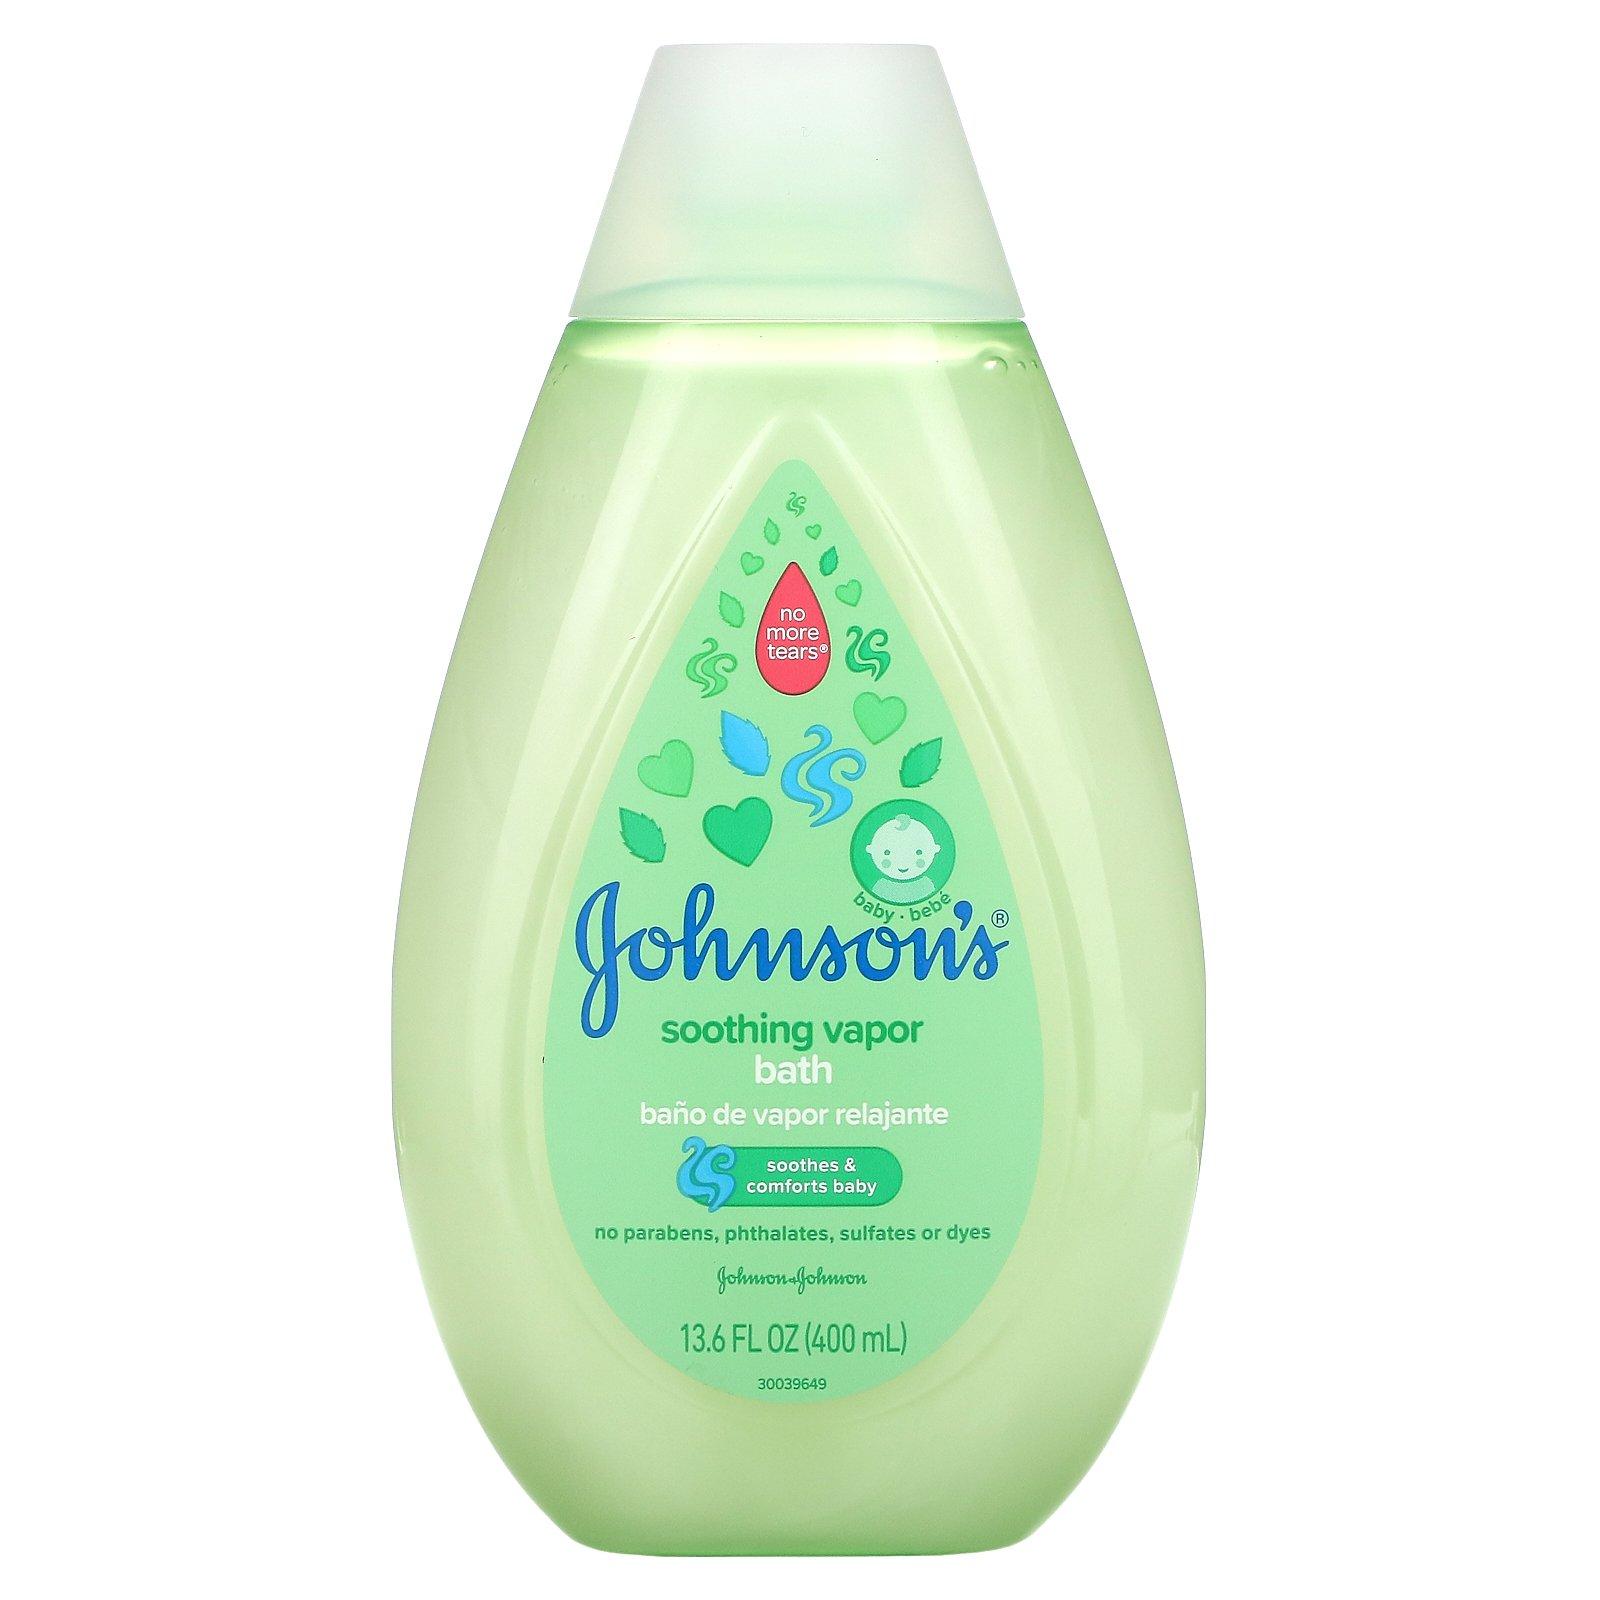 Johnson's Soothing Vapor Bath (400ml)